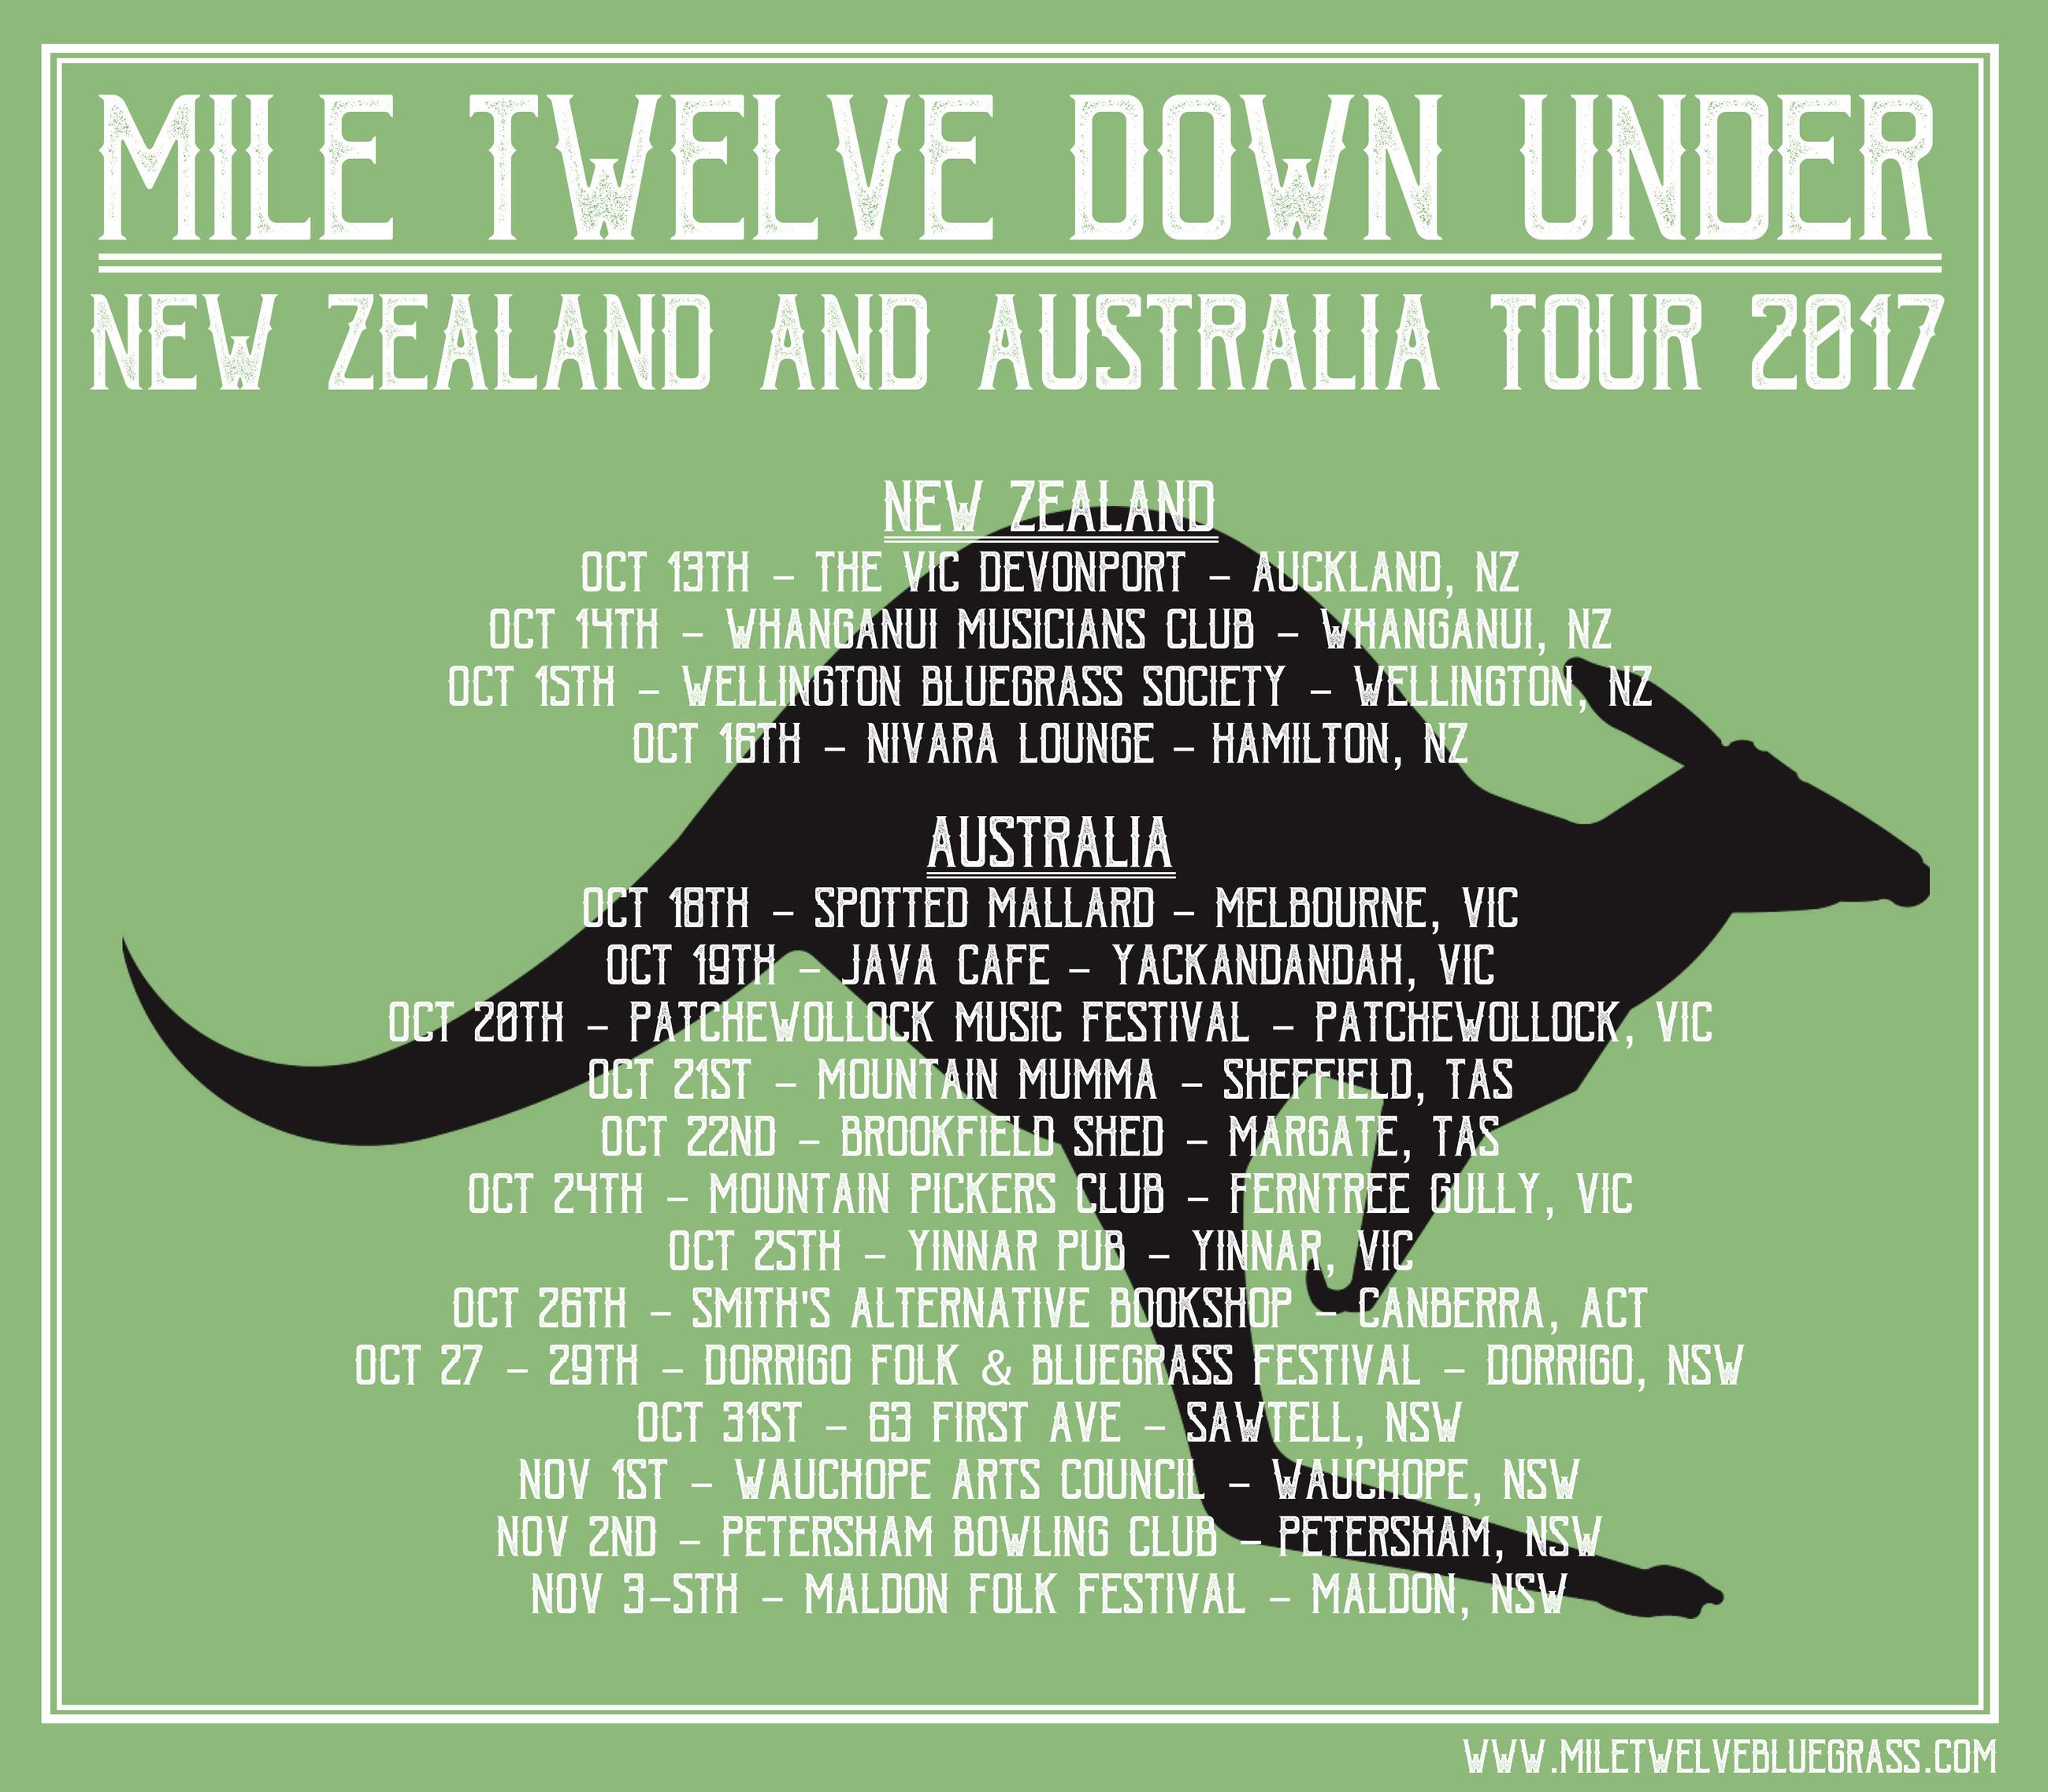 Click image for larger version. Name: Mile Twelve Down Under Promo.jpg Views: 3 Size: 624.6 KB ID: 161348